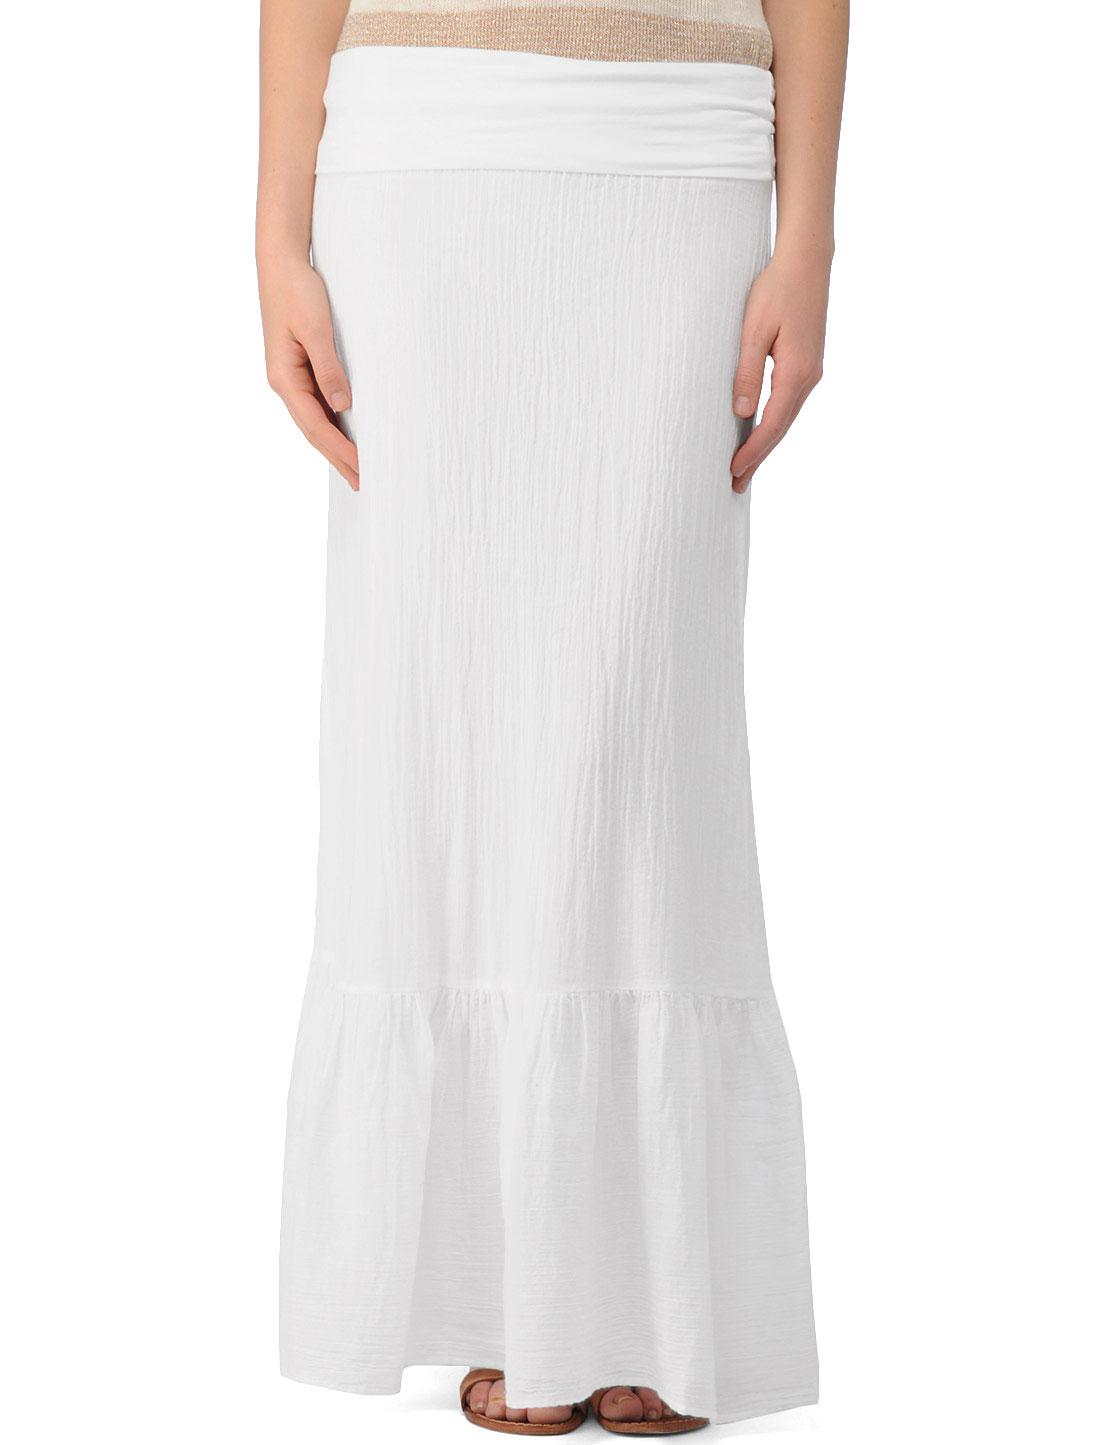 Splendid Linen and Jersey Maxi Skirt in White | Lyst